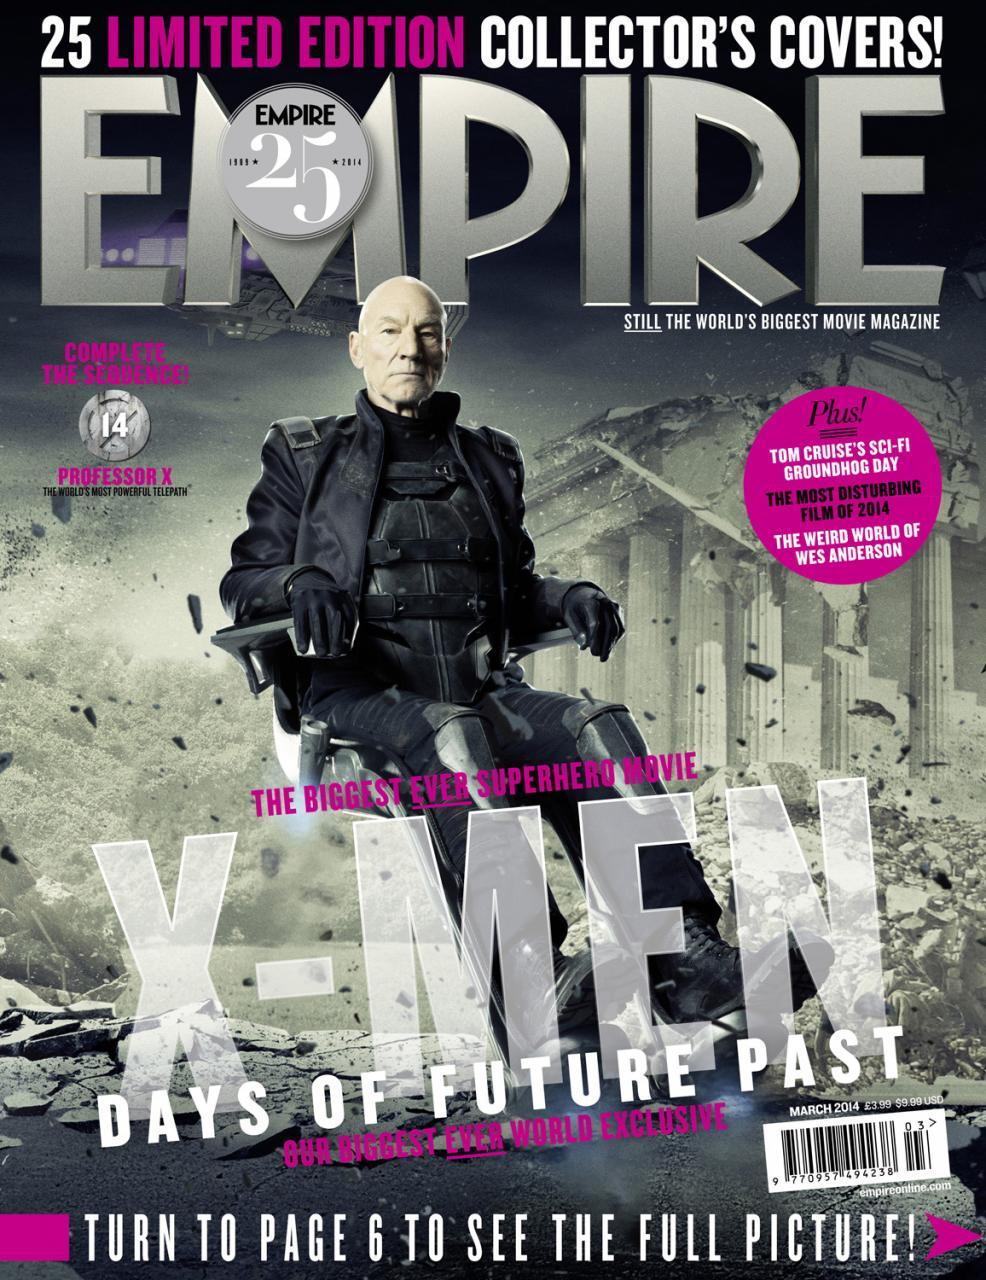 X-MEN DAYS OF FUTURE PAST Empire Magazine Covers  (6)